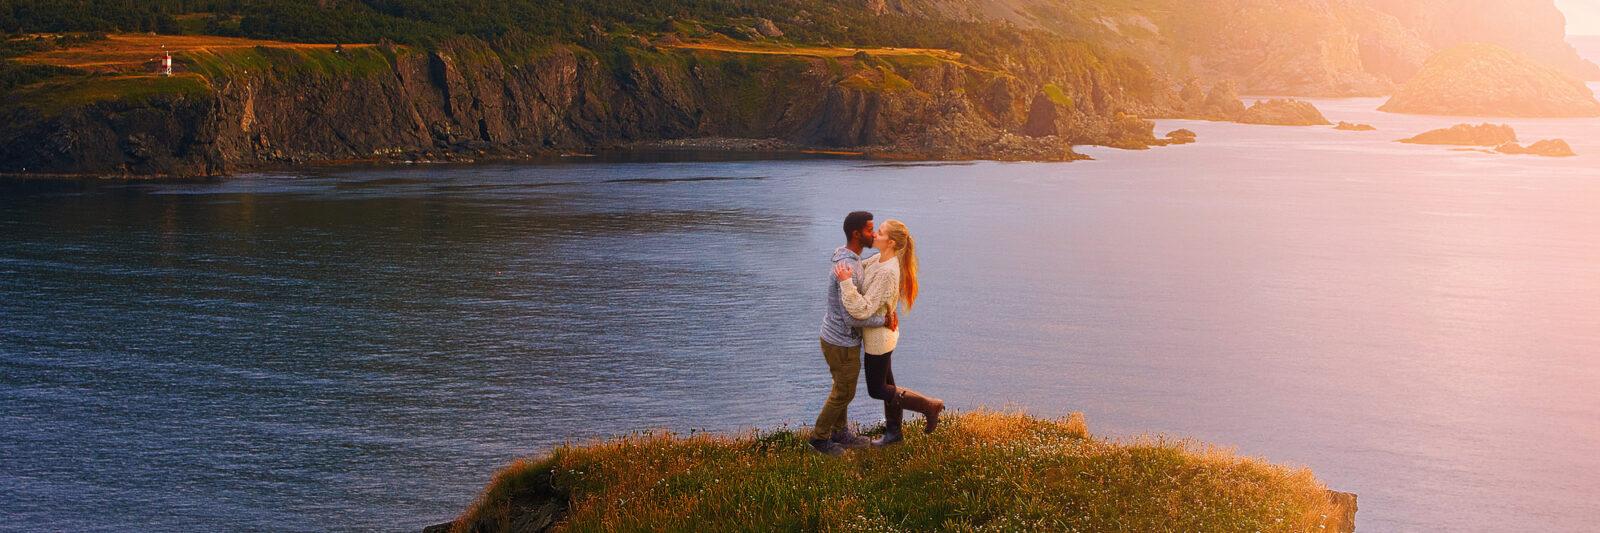 couple kissing on west newfoundland itinerary at sunset